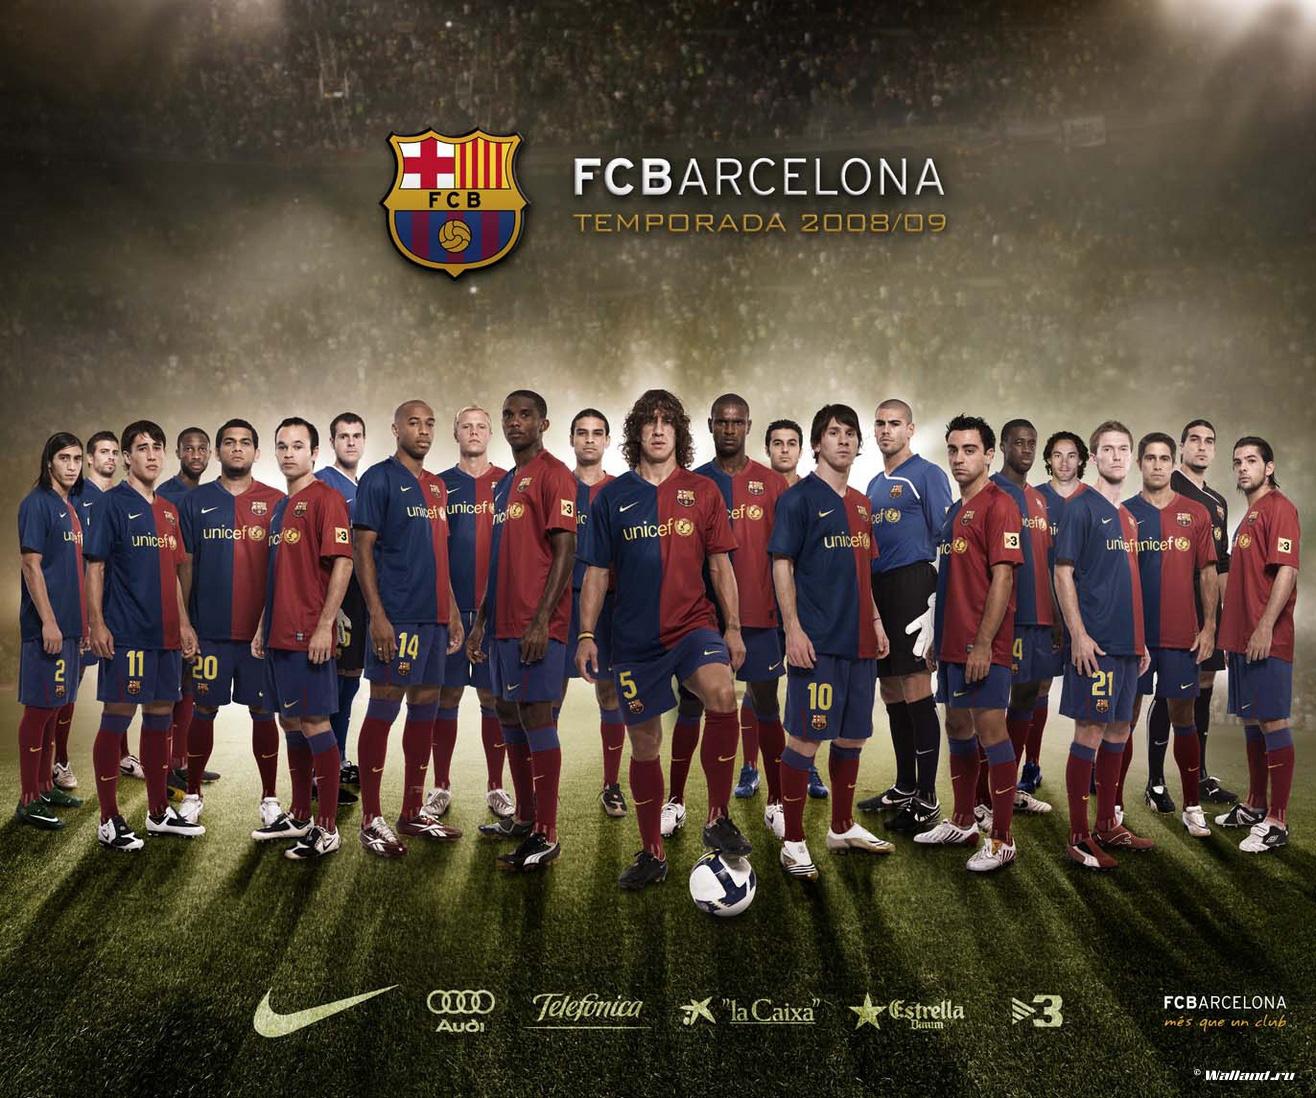 Тито Виланова официально возглавил «Барселону»